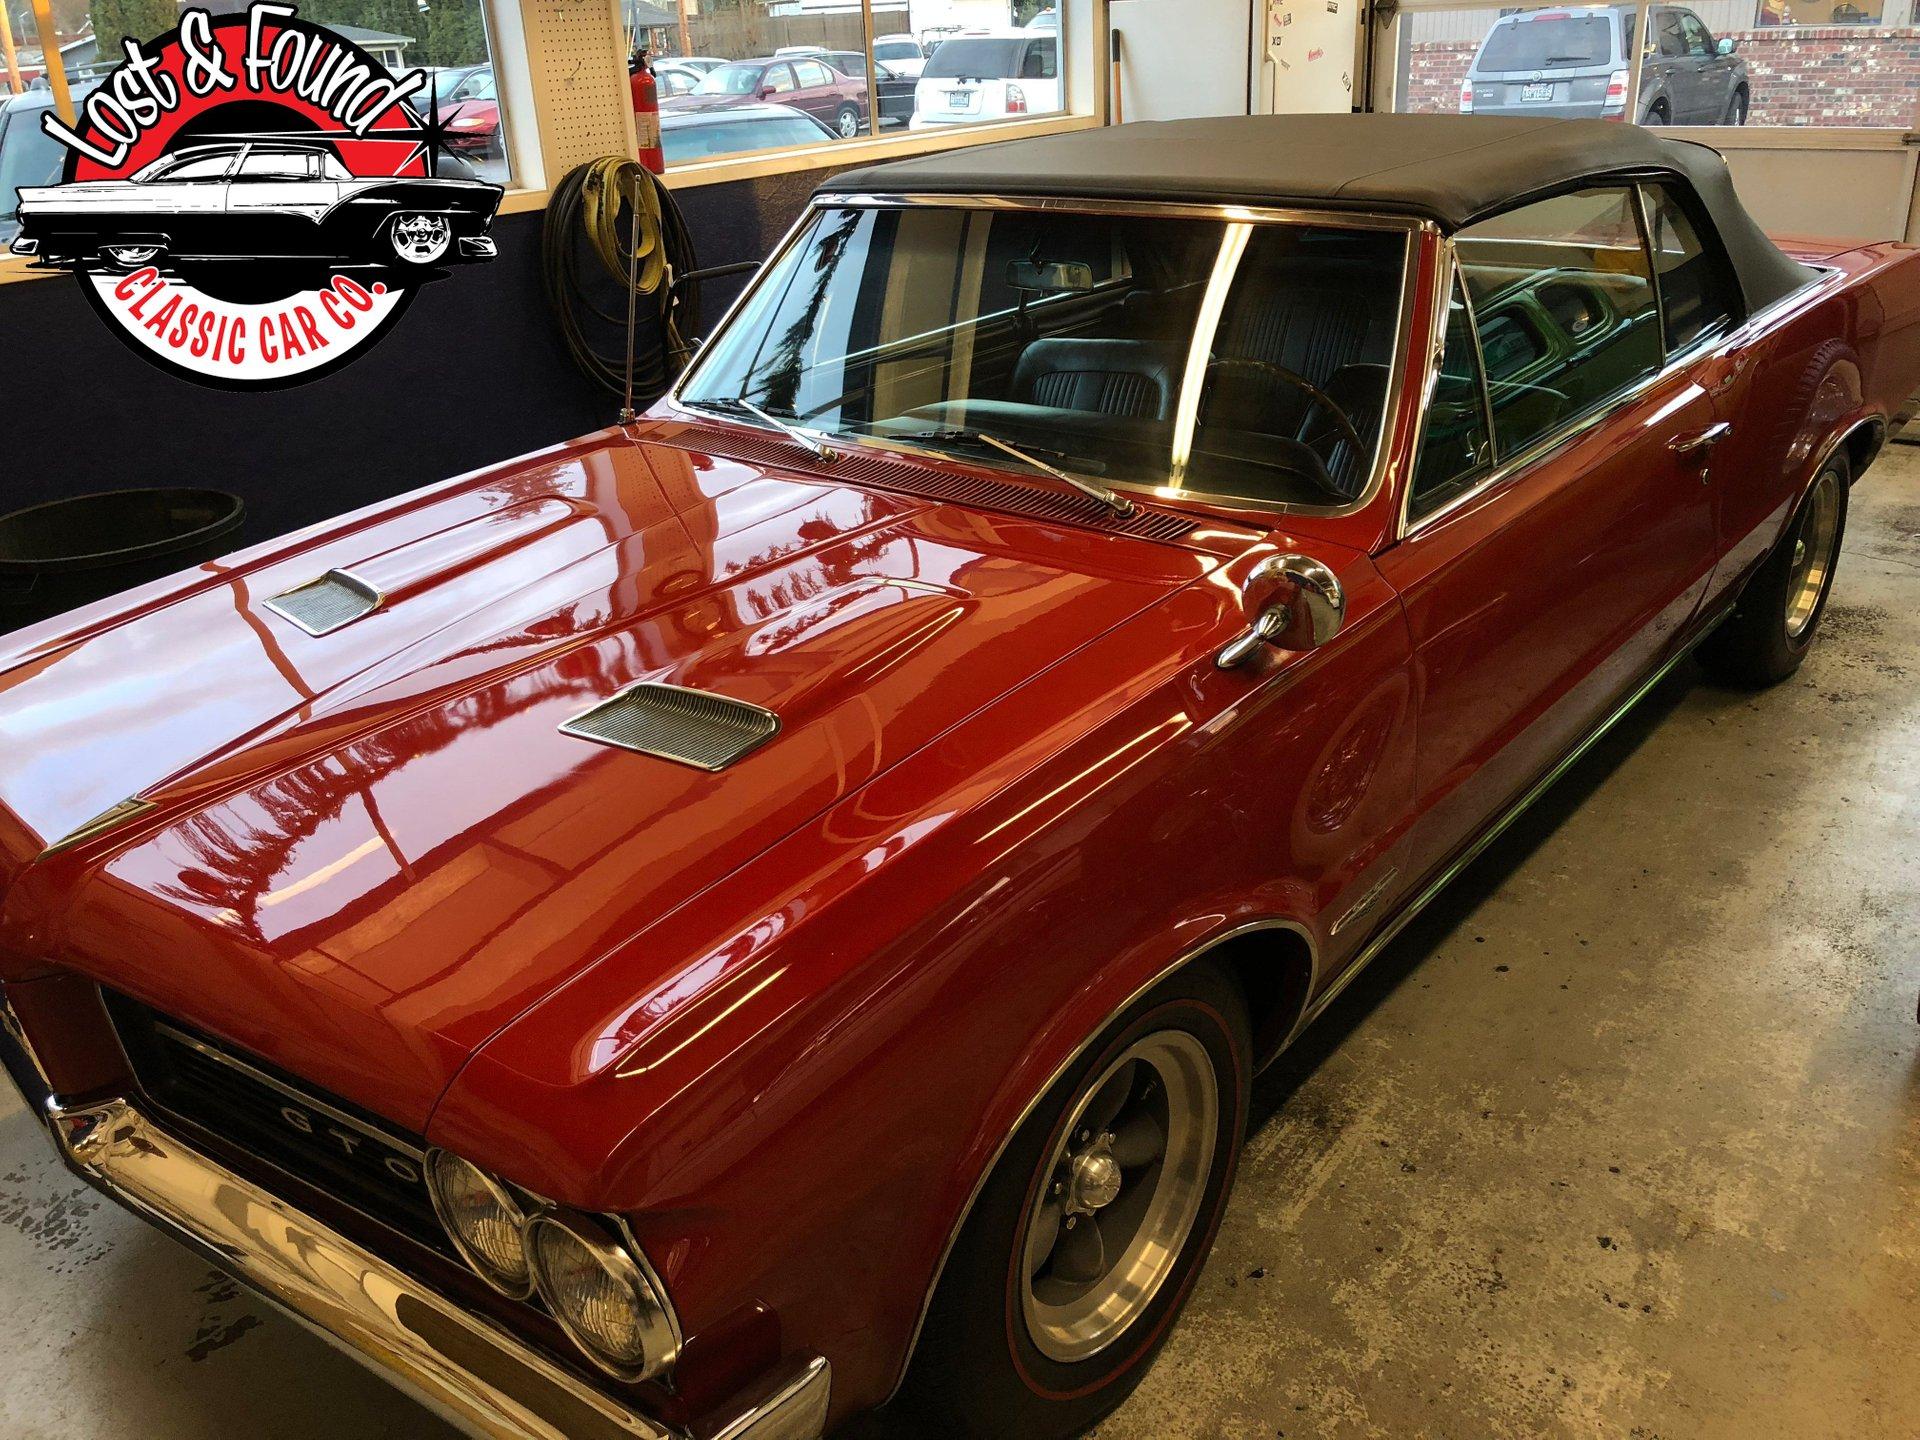 1964 Pontiac Gto Convertible Lost Found Classic Car Co 1960